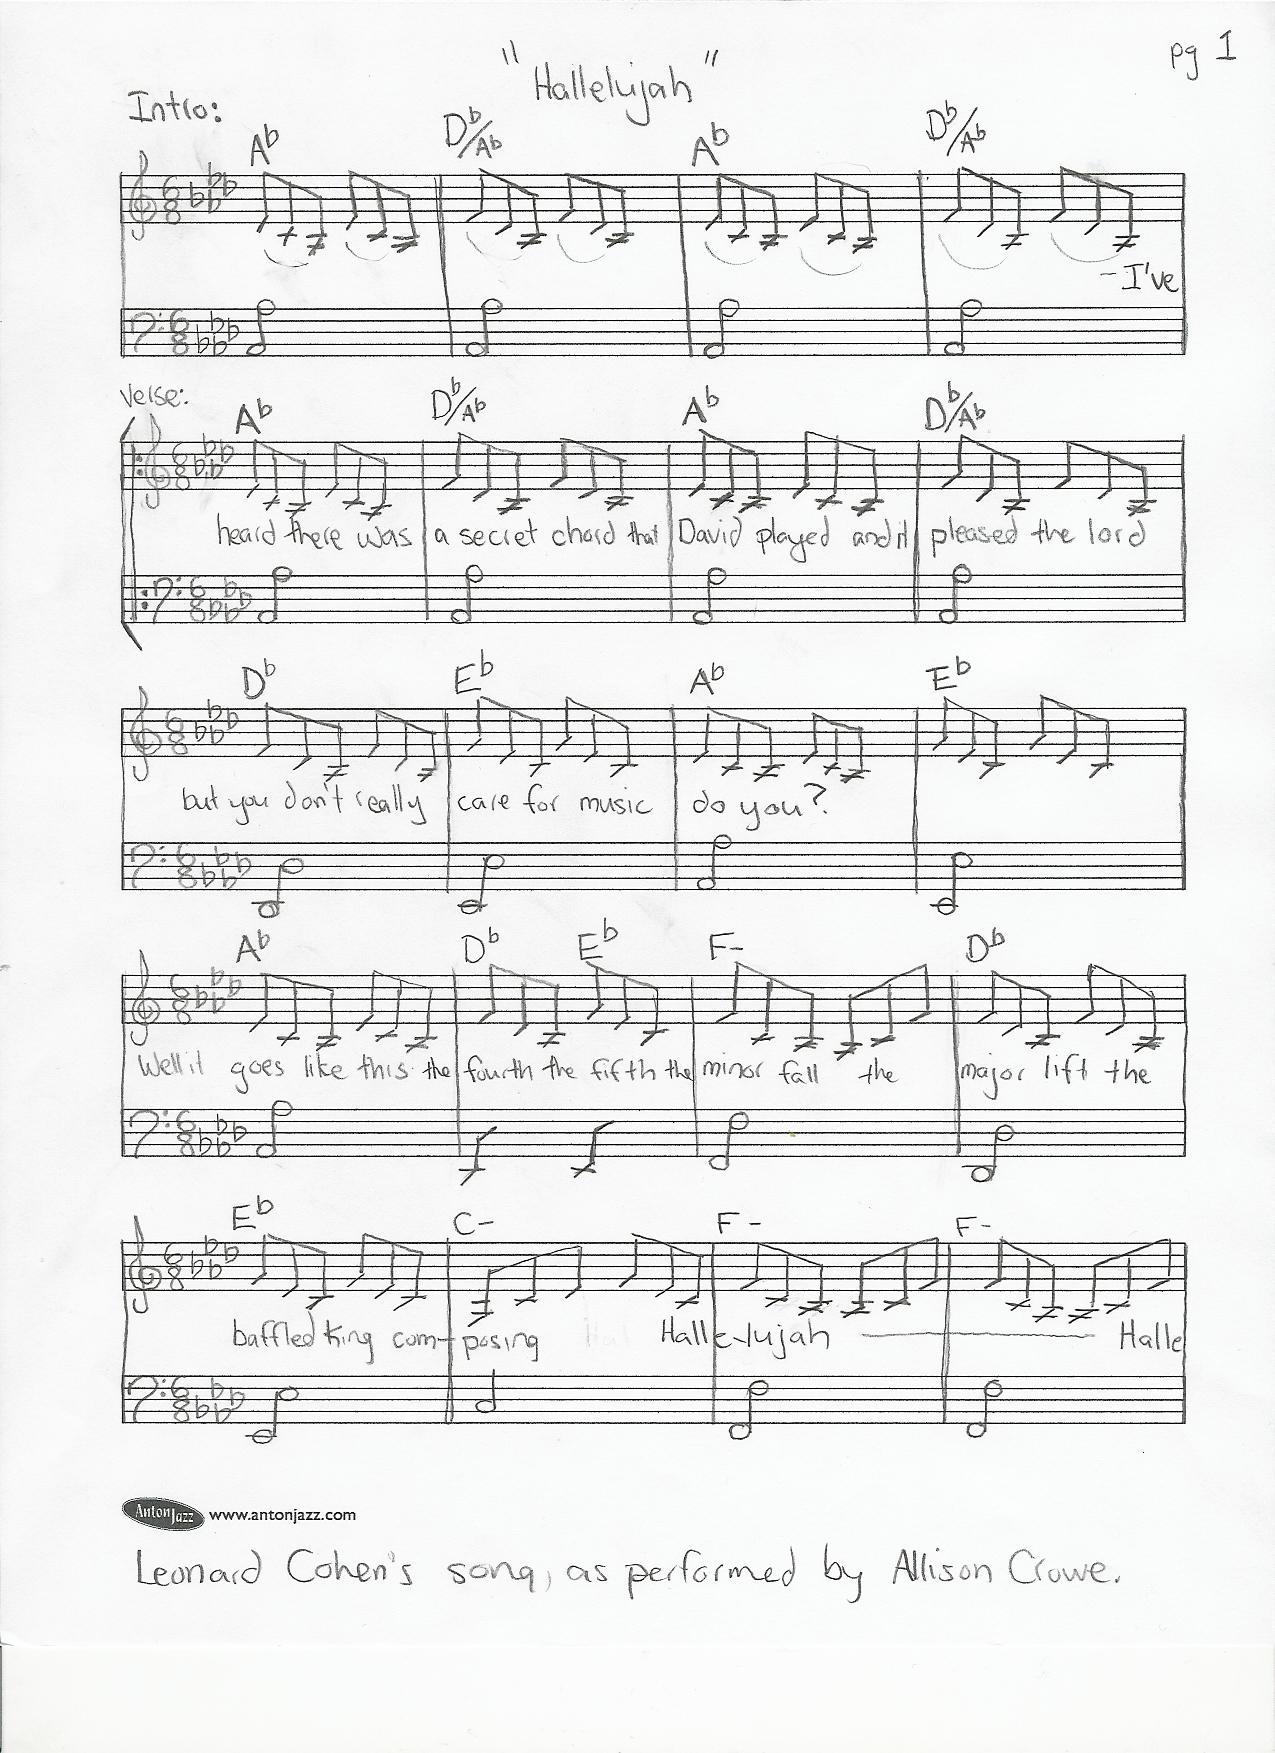 Hallelujah by Leonard Cohen performed by Allison Crowe - Sheet Music